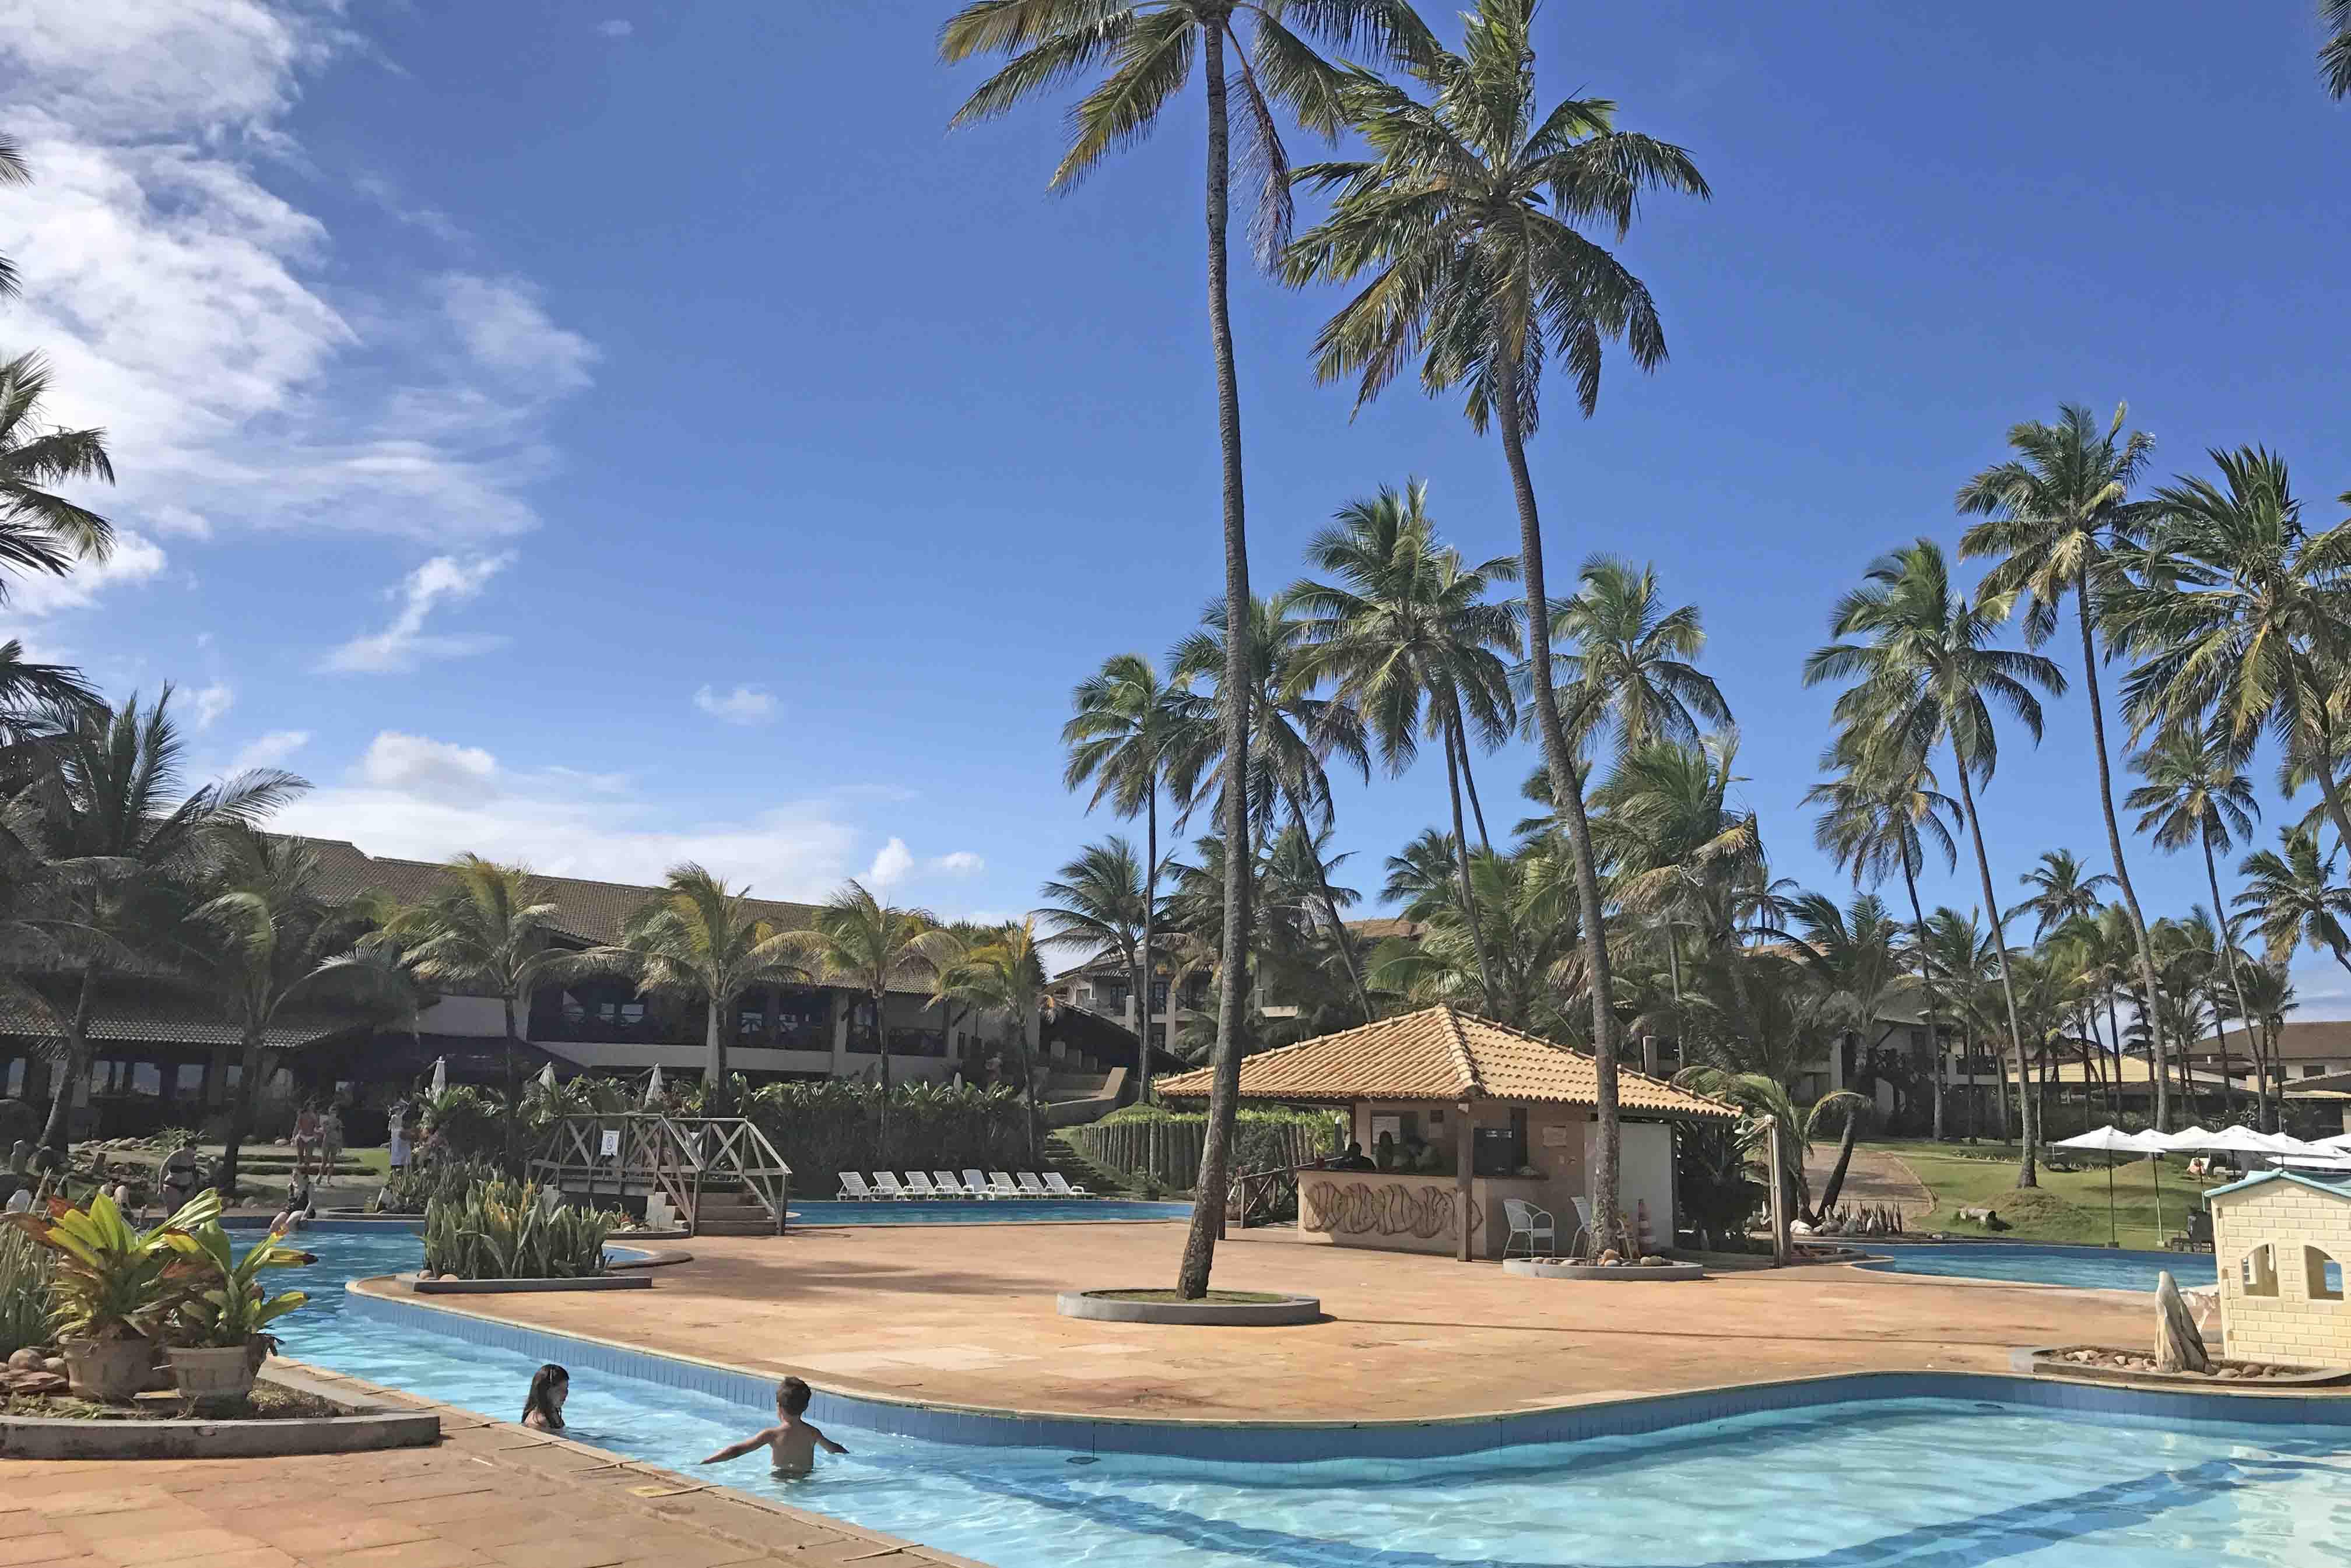 catussaba resort salvador bahia